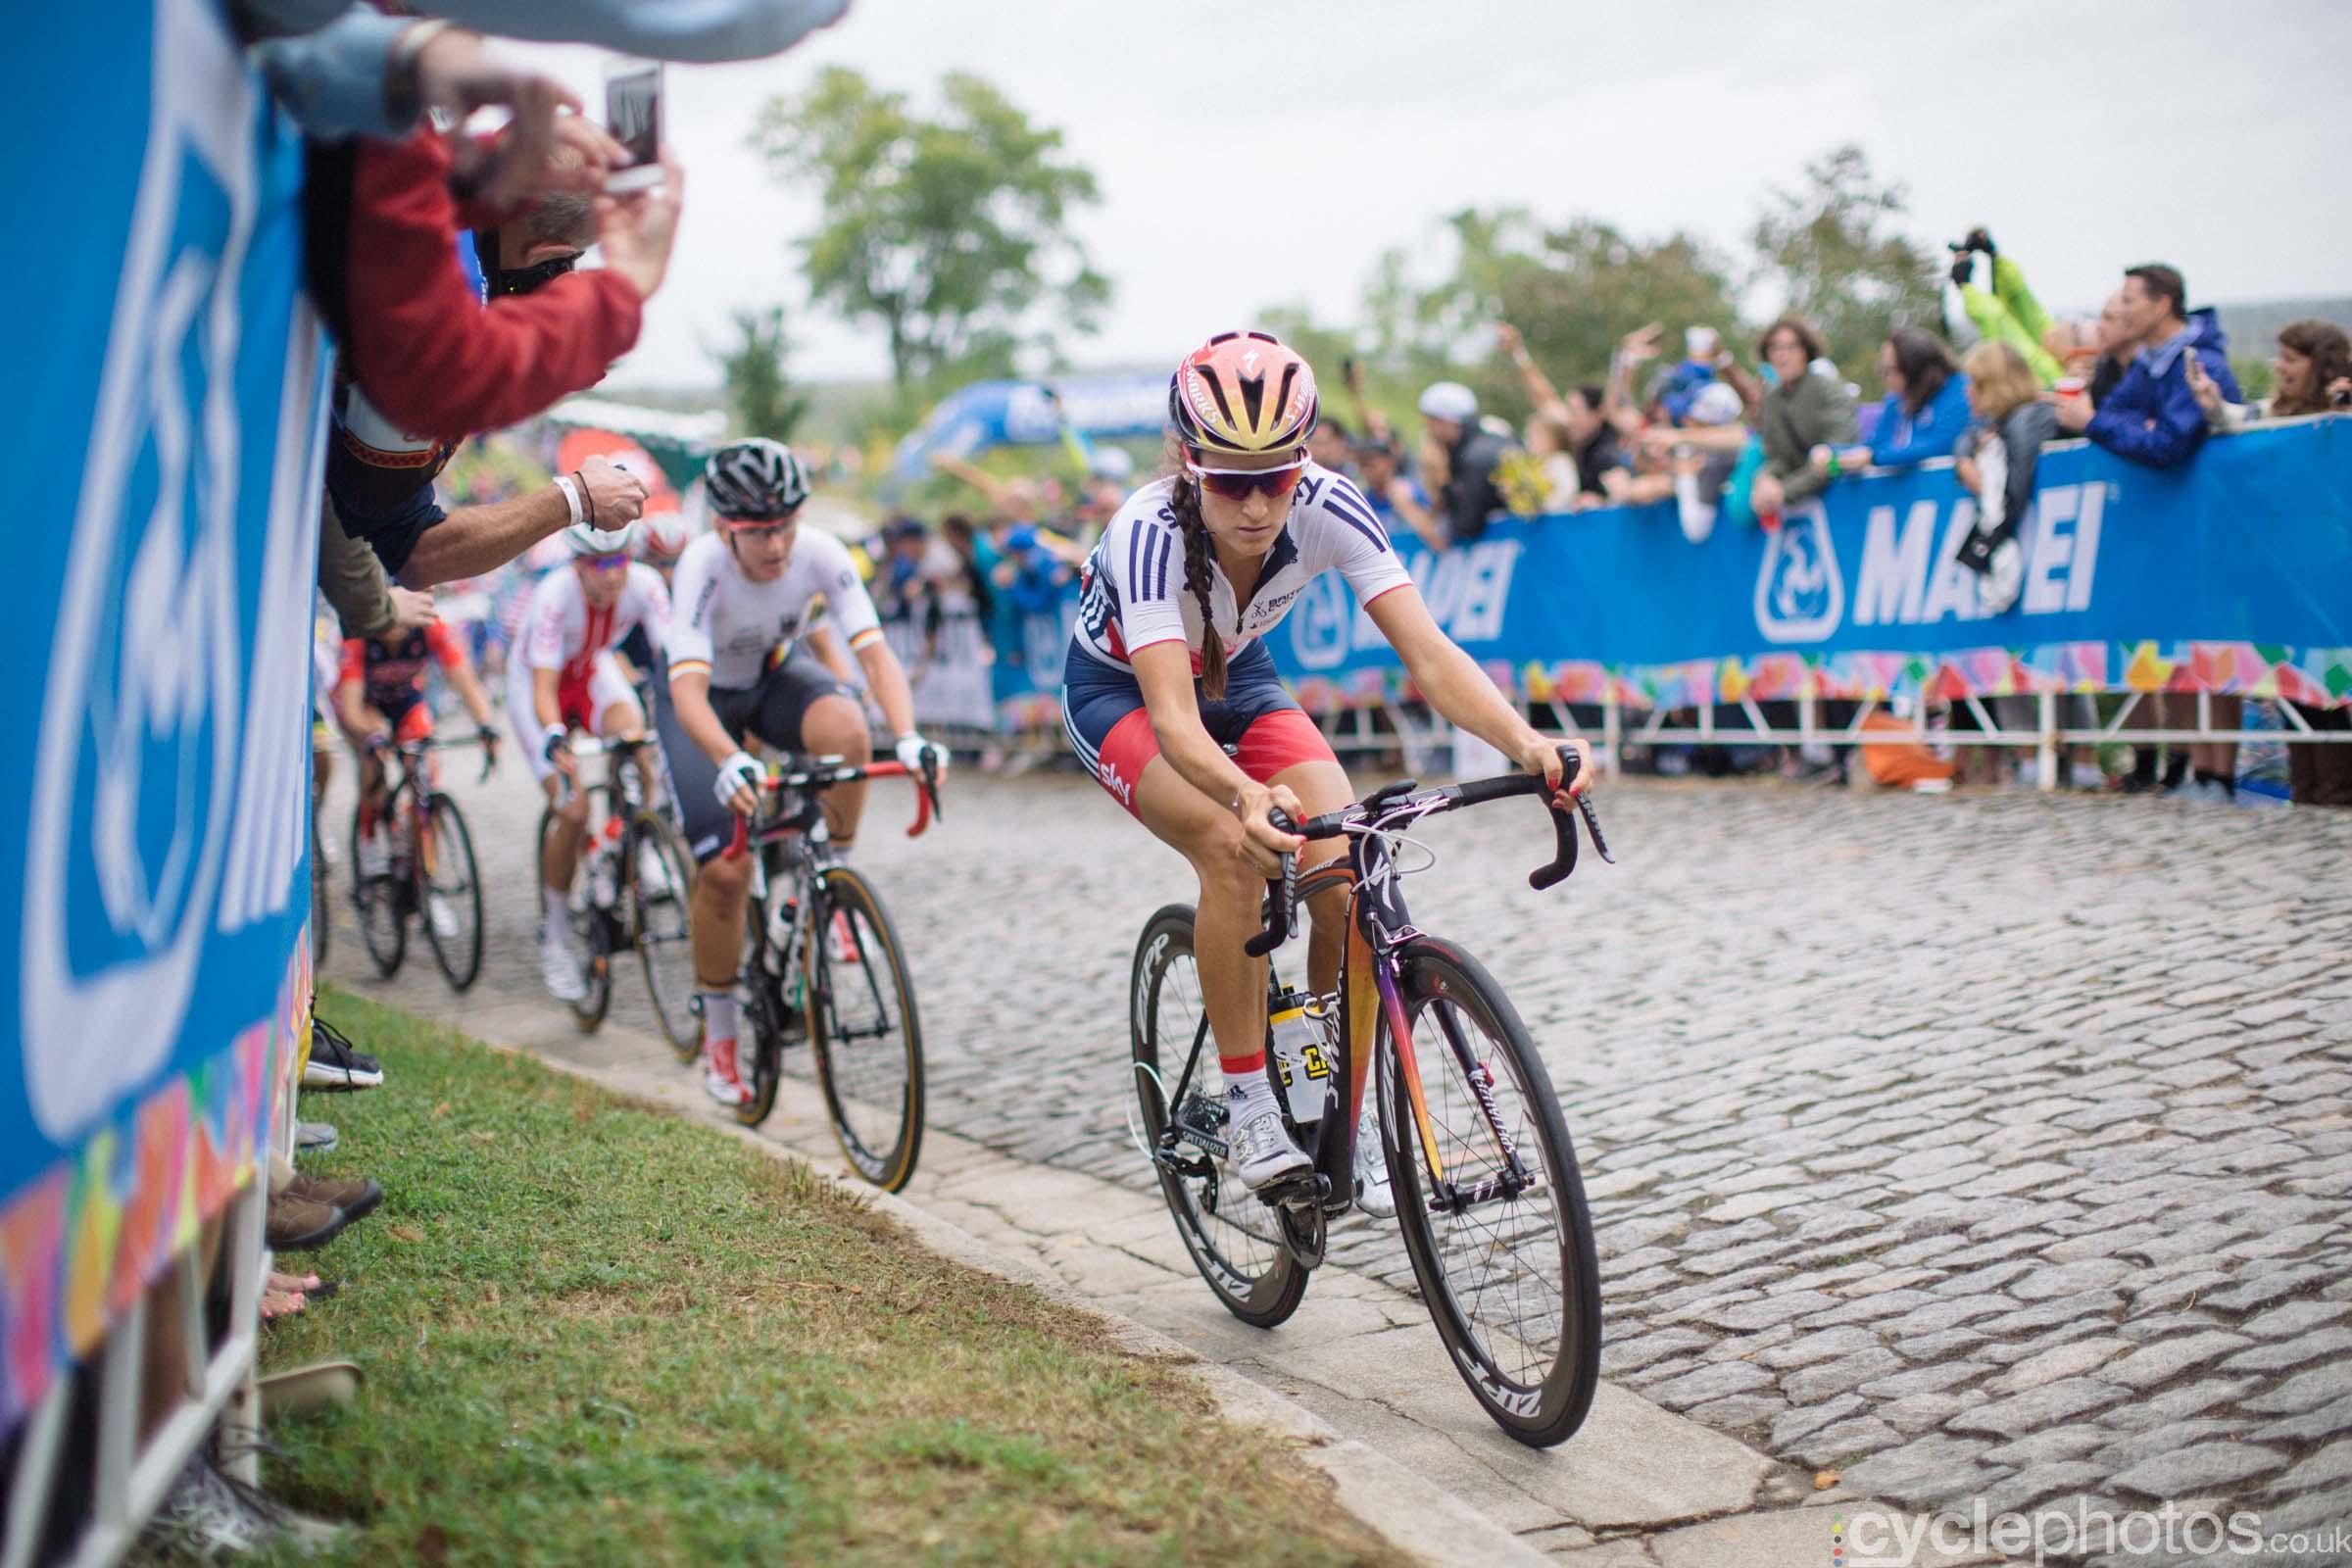 cyclephotos-world-champs-richmond-152515